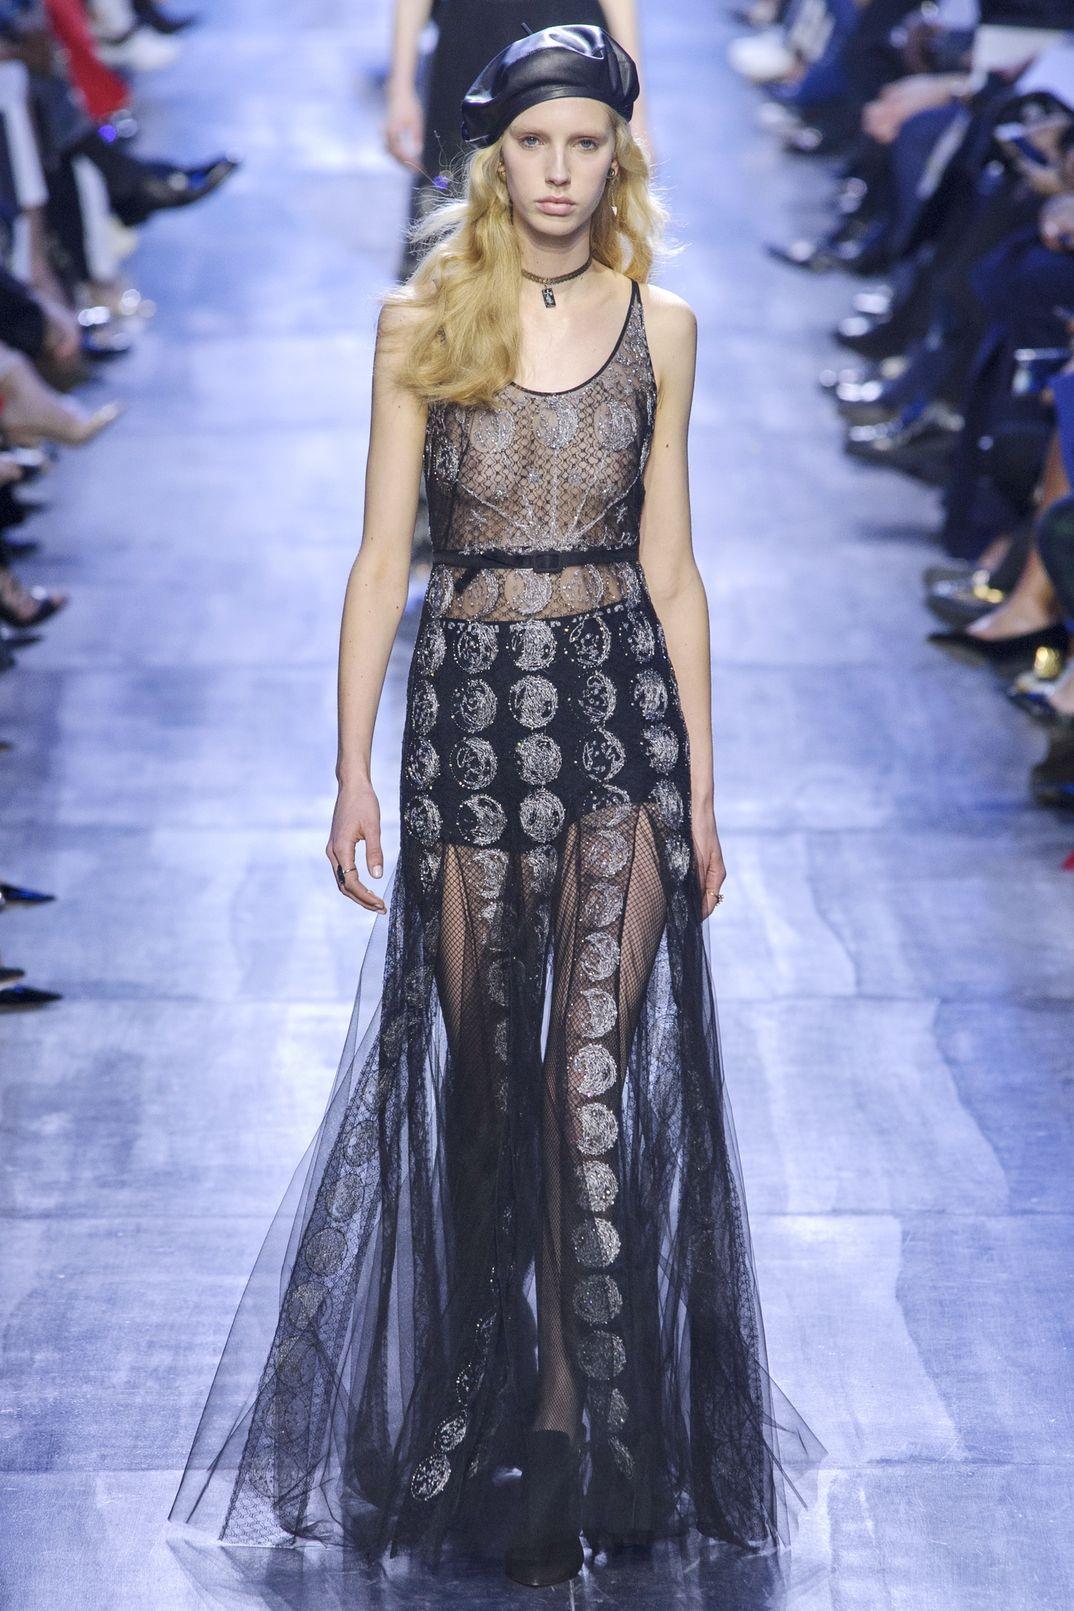 París Fashion Week: Christian Dior Otoño-Invjerno 2017/18